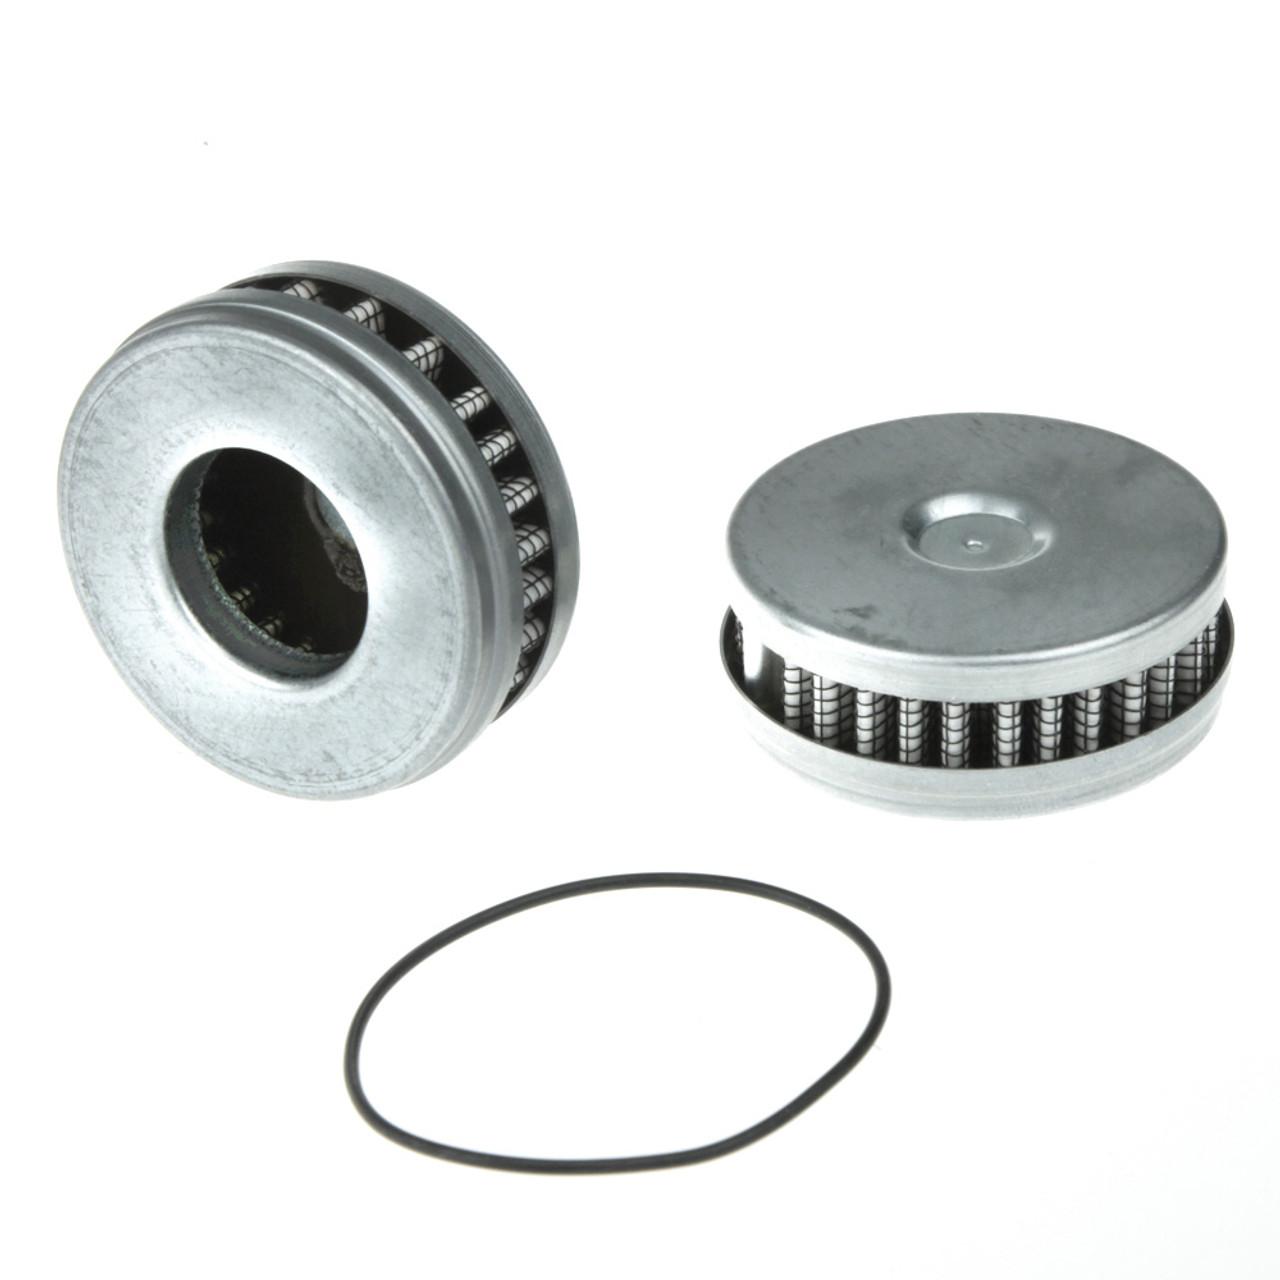 Viale Liquid Lpg Filter With Orings Peco Fuel Filters Vialle Set O Rings